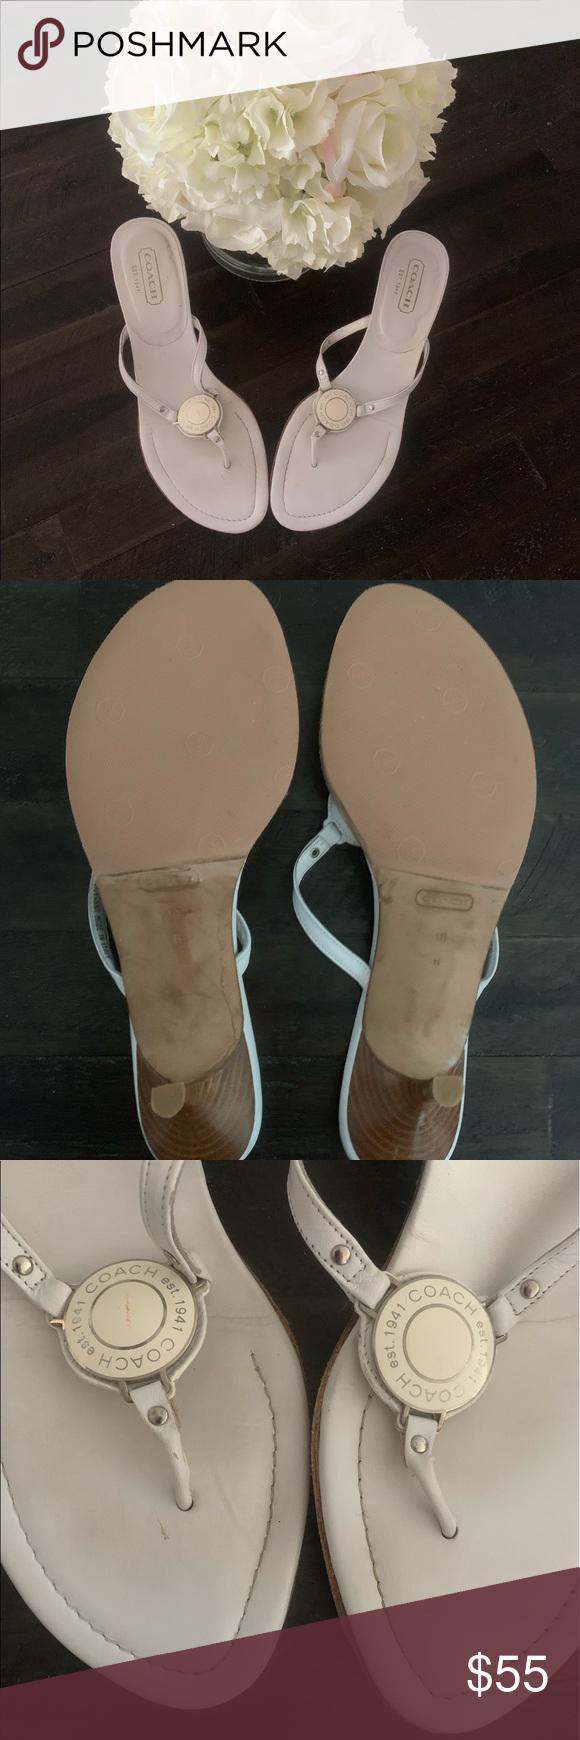 Vintage Coach kitten heel leather white sandals 10 Genuine Vintage Coach leather…